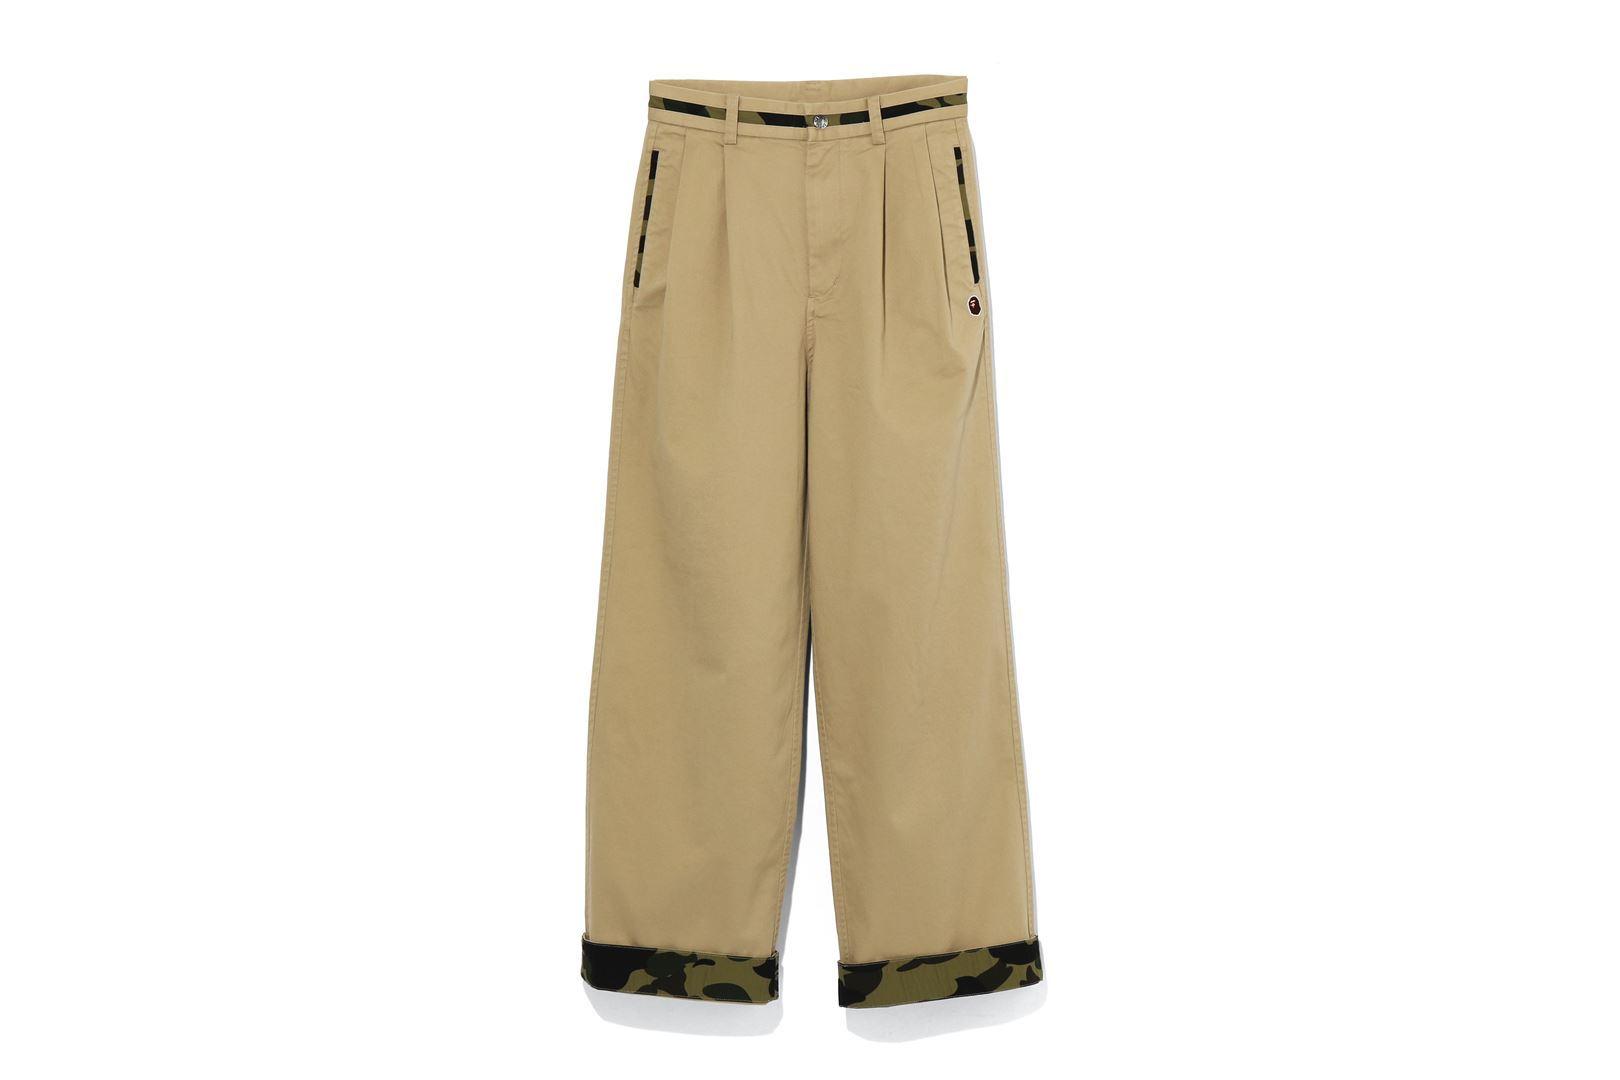 1ST CAMO LINE CHINO PANTS_a0174495_12024575.jpg